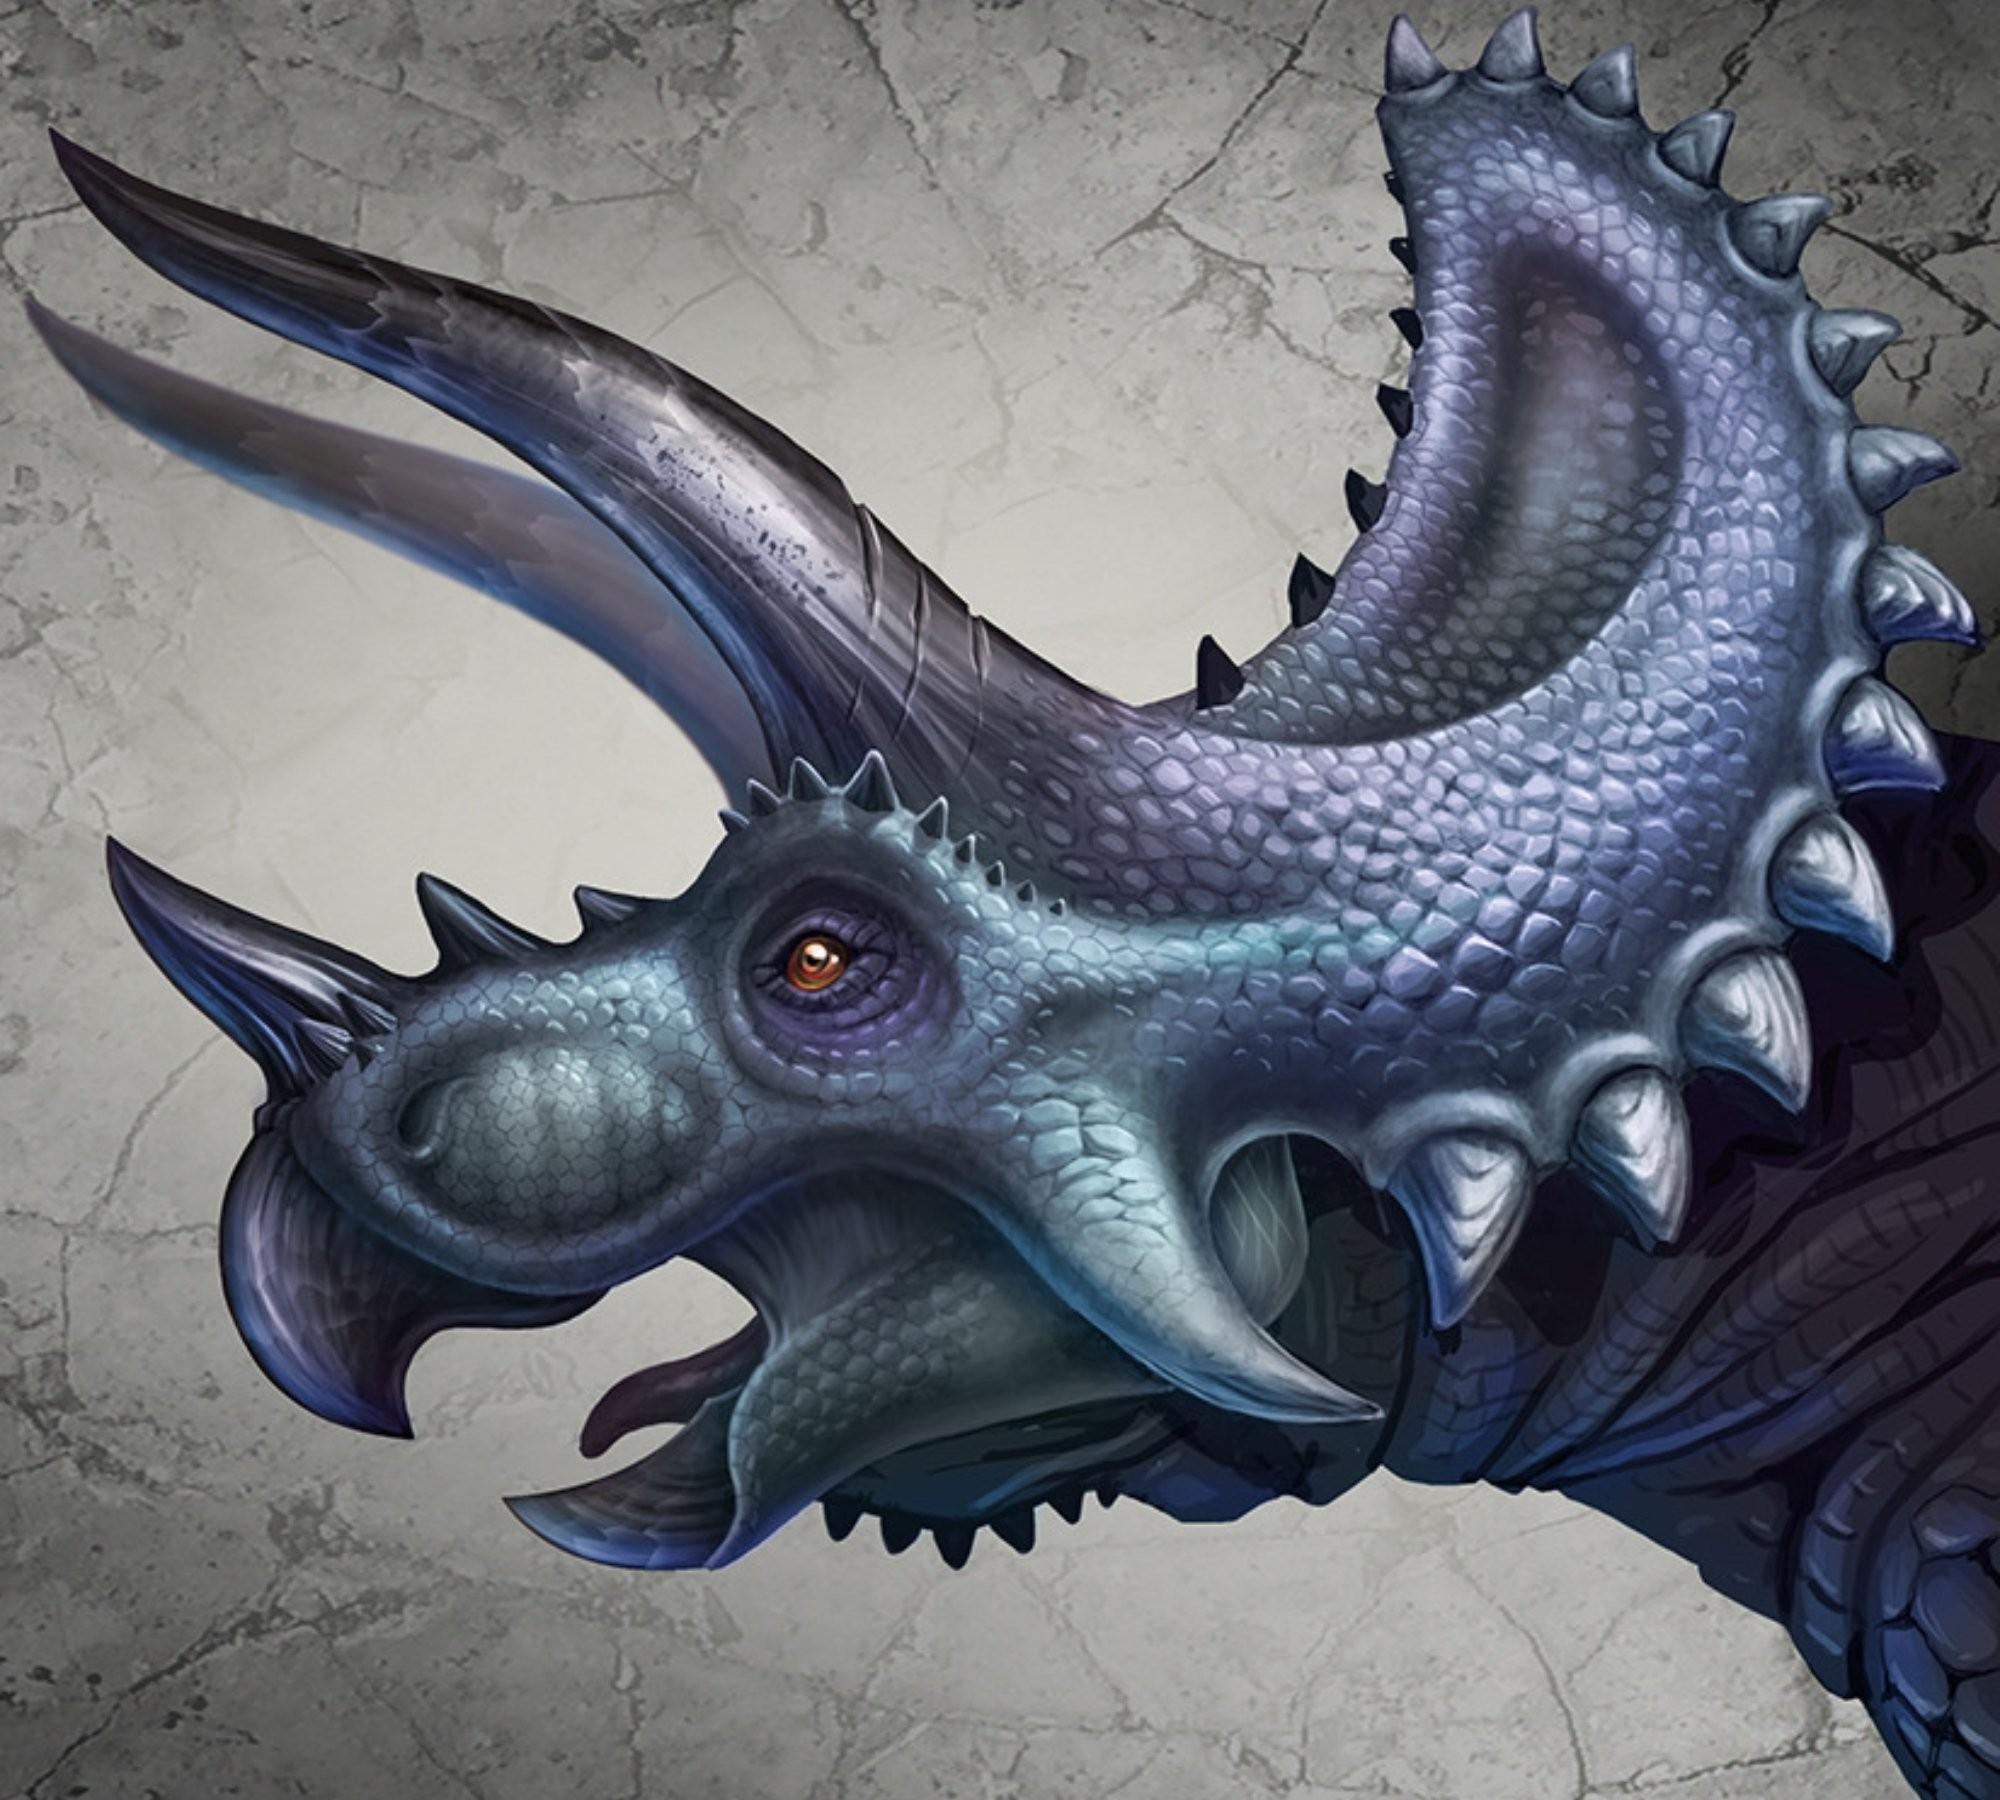 2000x1800 px animals dinosaurs Triceratops